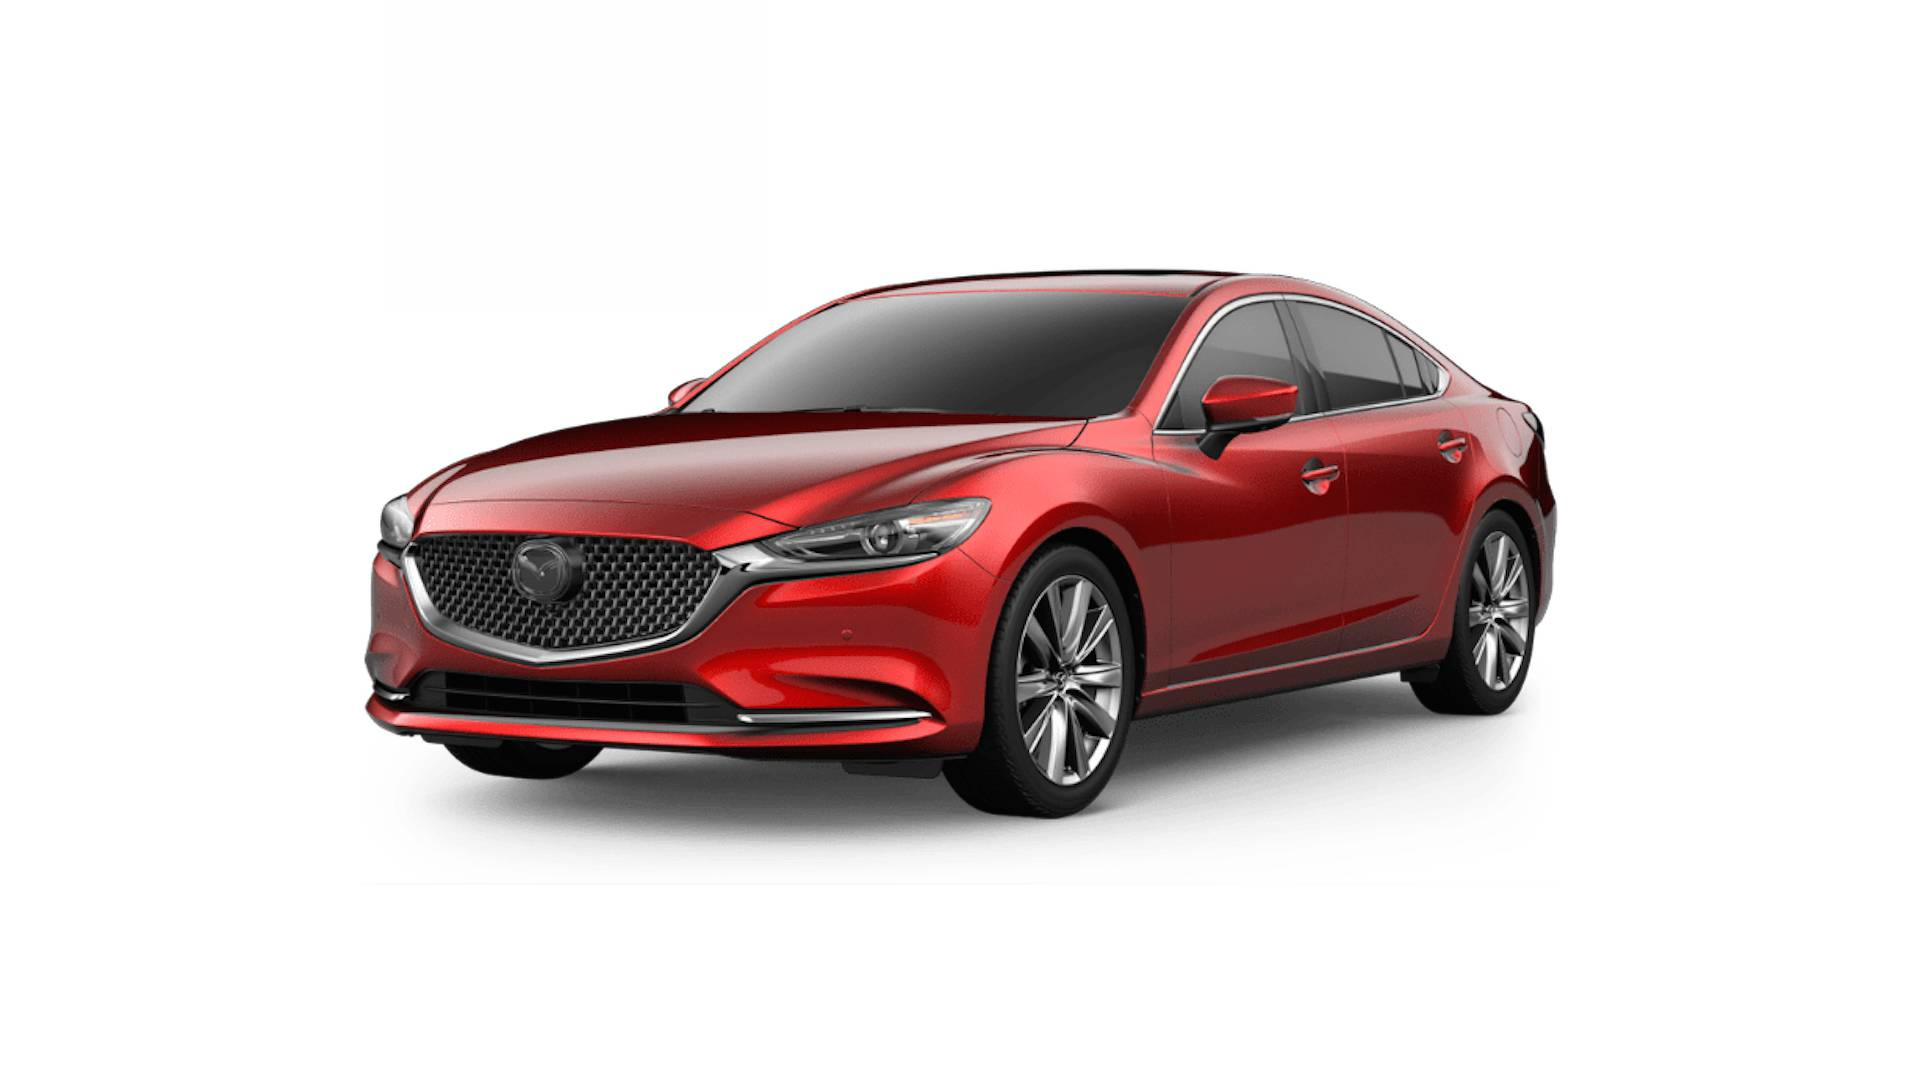 Kelebihan Mazda 2018 Harga